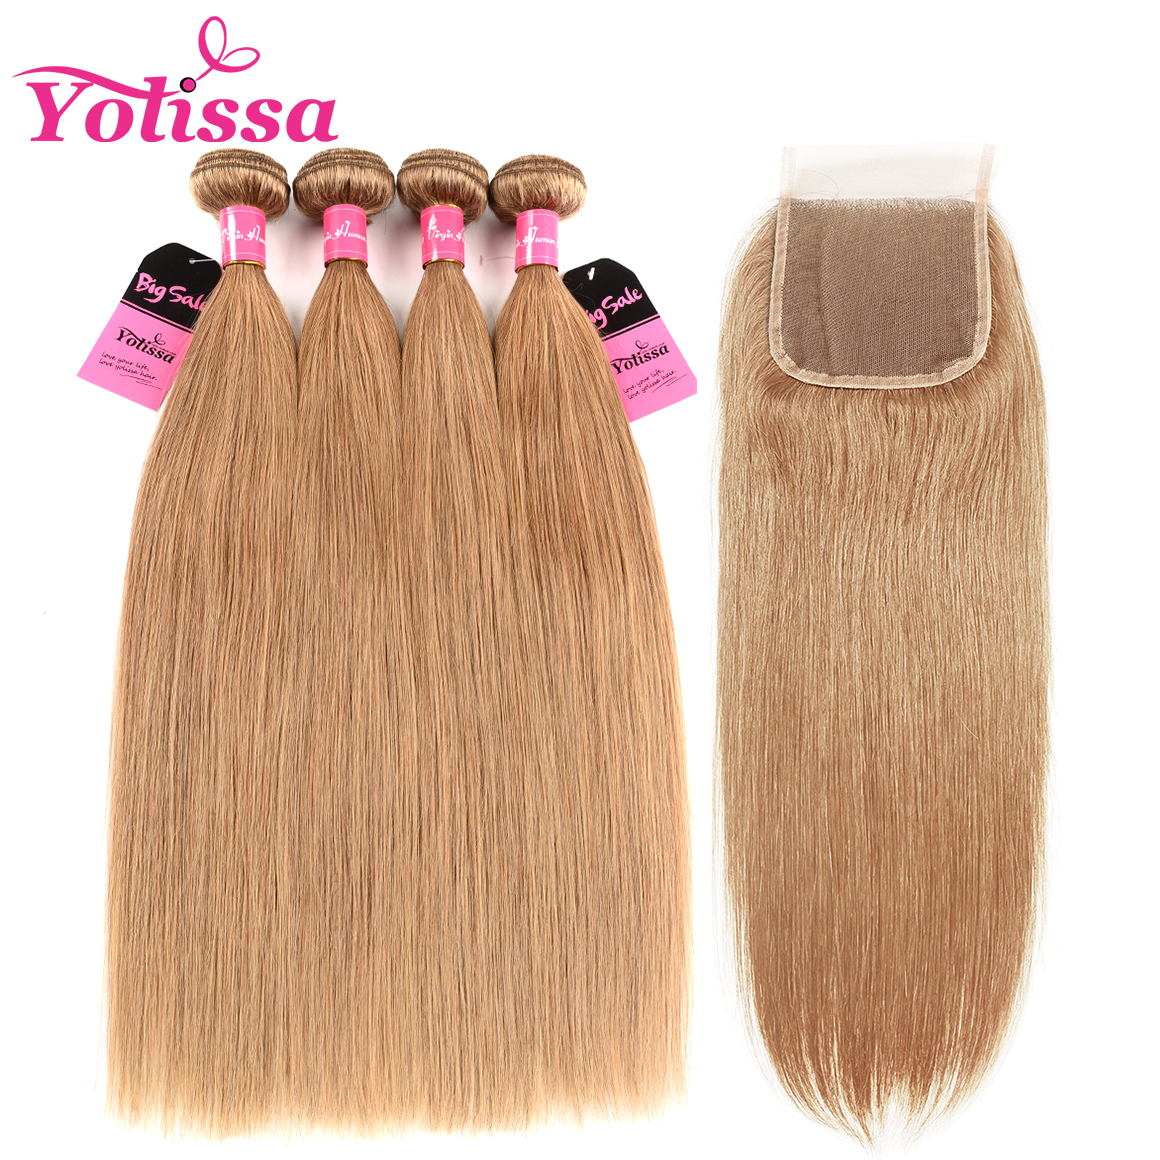 Straight Hair 4 Bundles With Closure 4×4 Camarel Hair Color